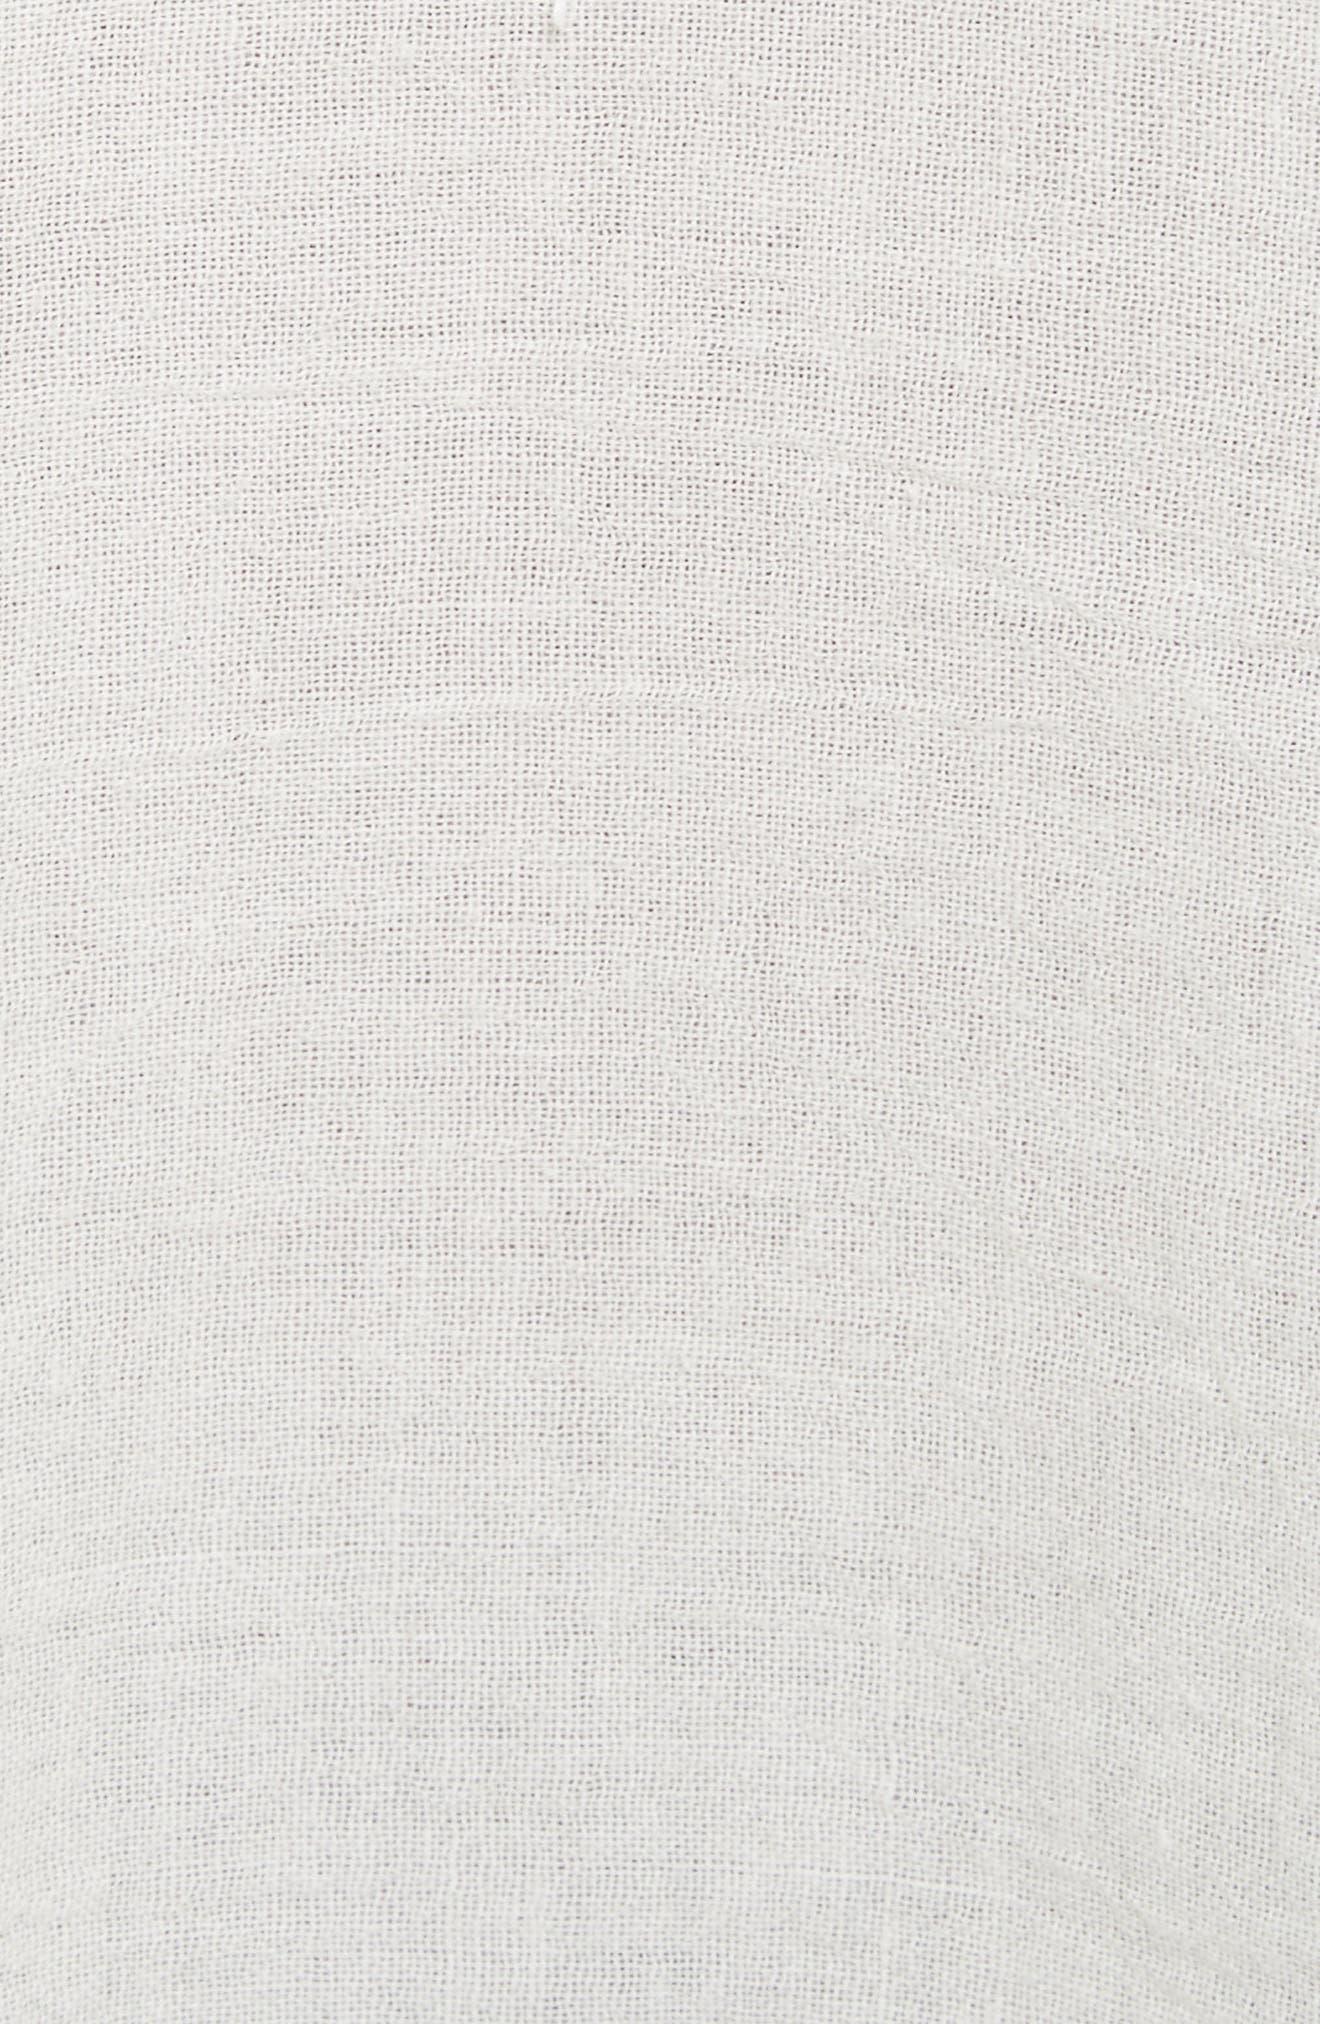 Fiona Ruffle Cotton Eyelet Top,                             Alternate thumbnail 5, color,                             100